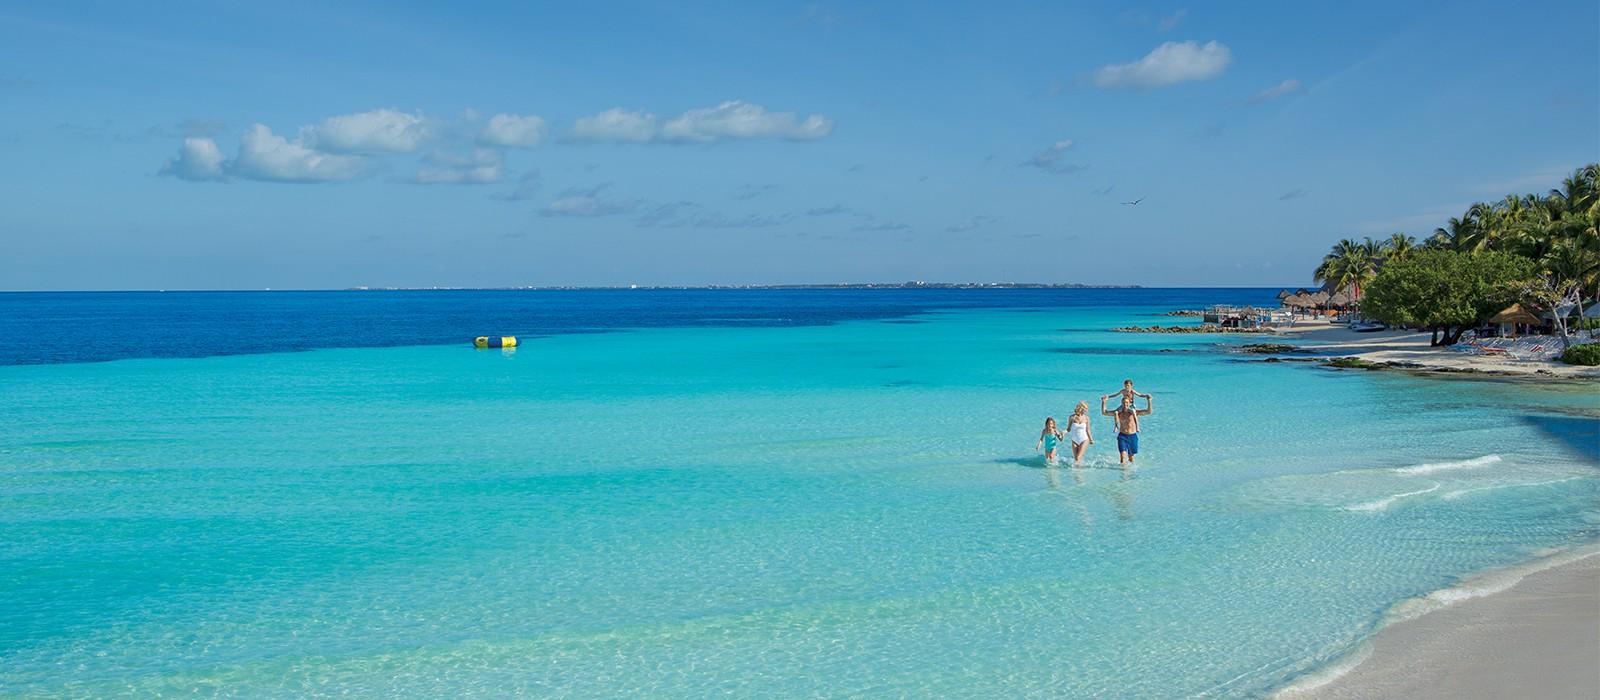 Header - Dreams Sands Riviera Cancun - Luxury Mexico Holidays